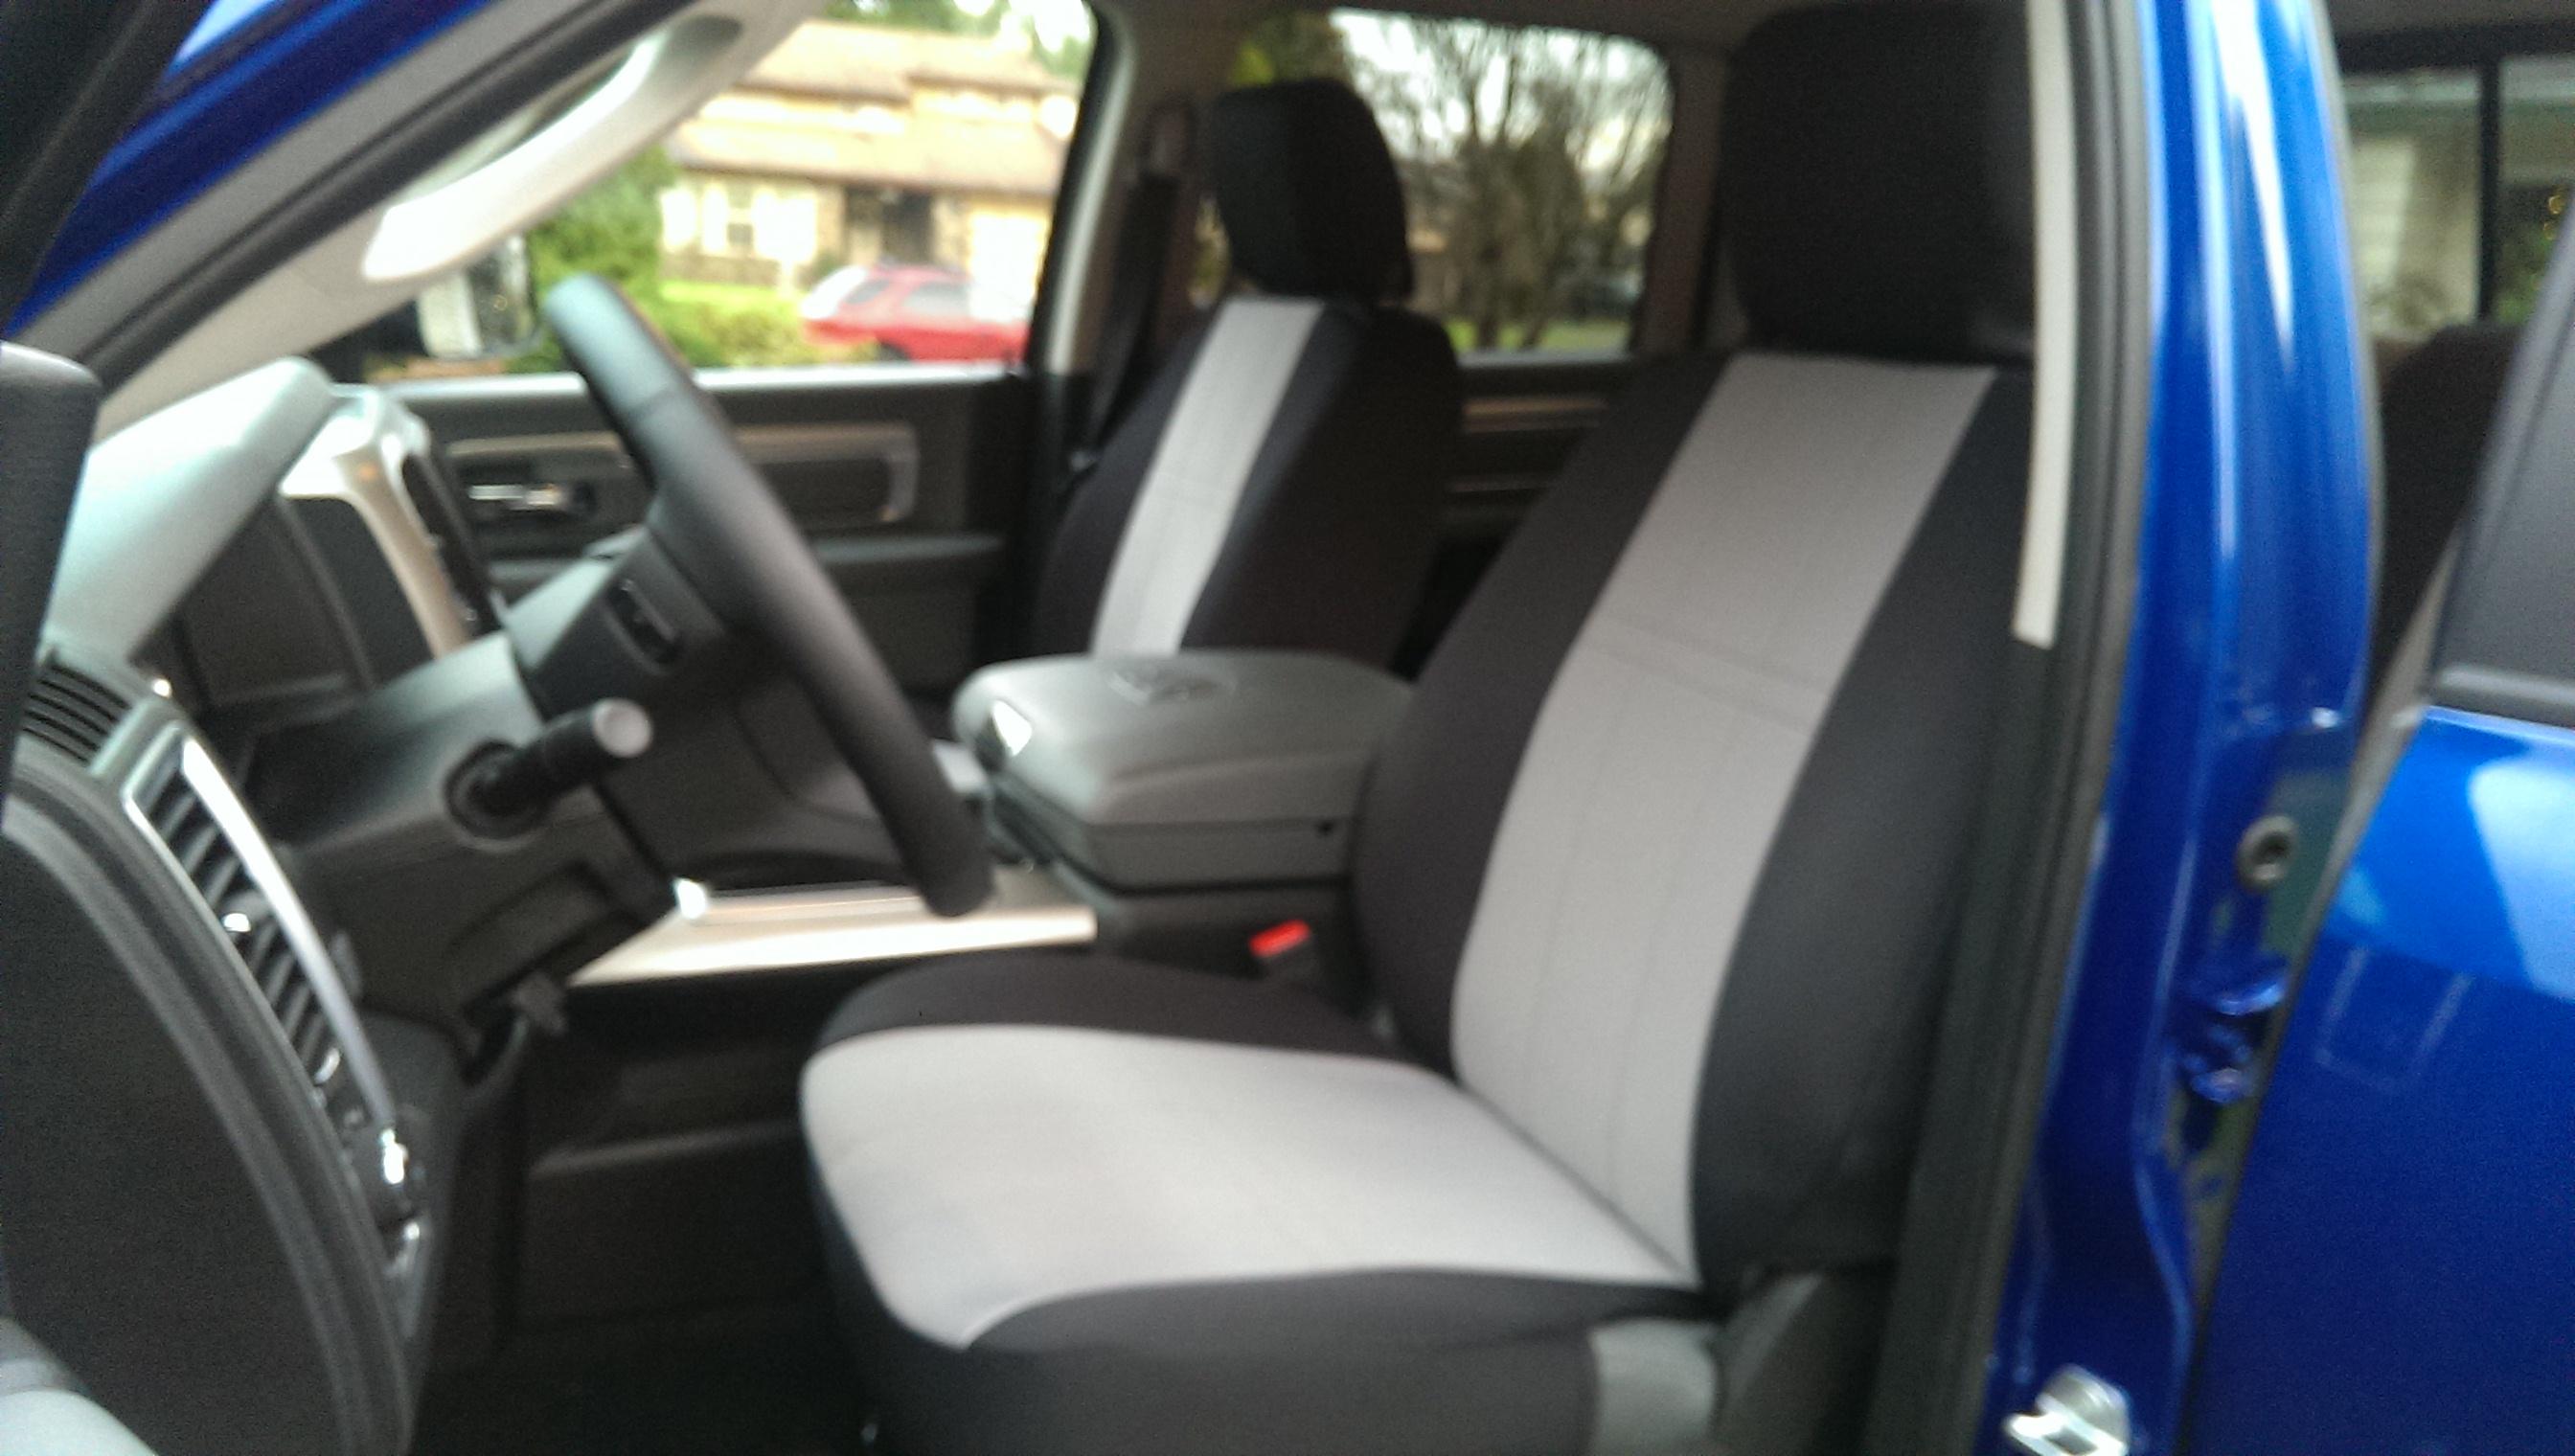 Seat covers imag0612 jpg